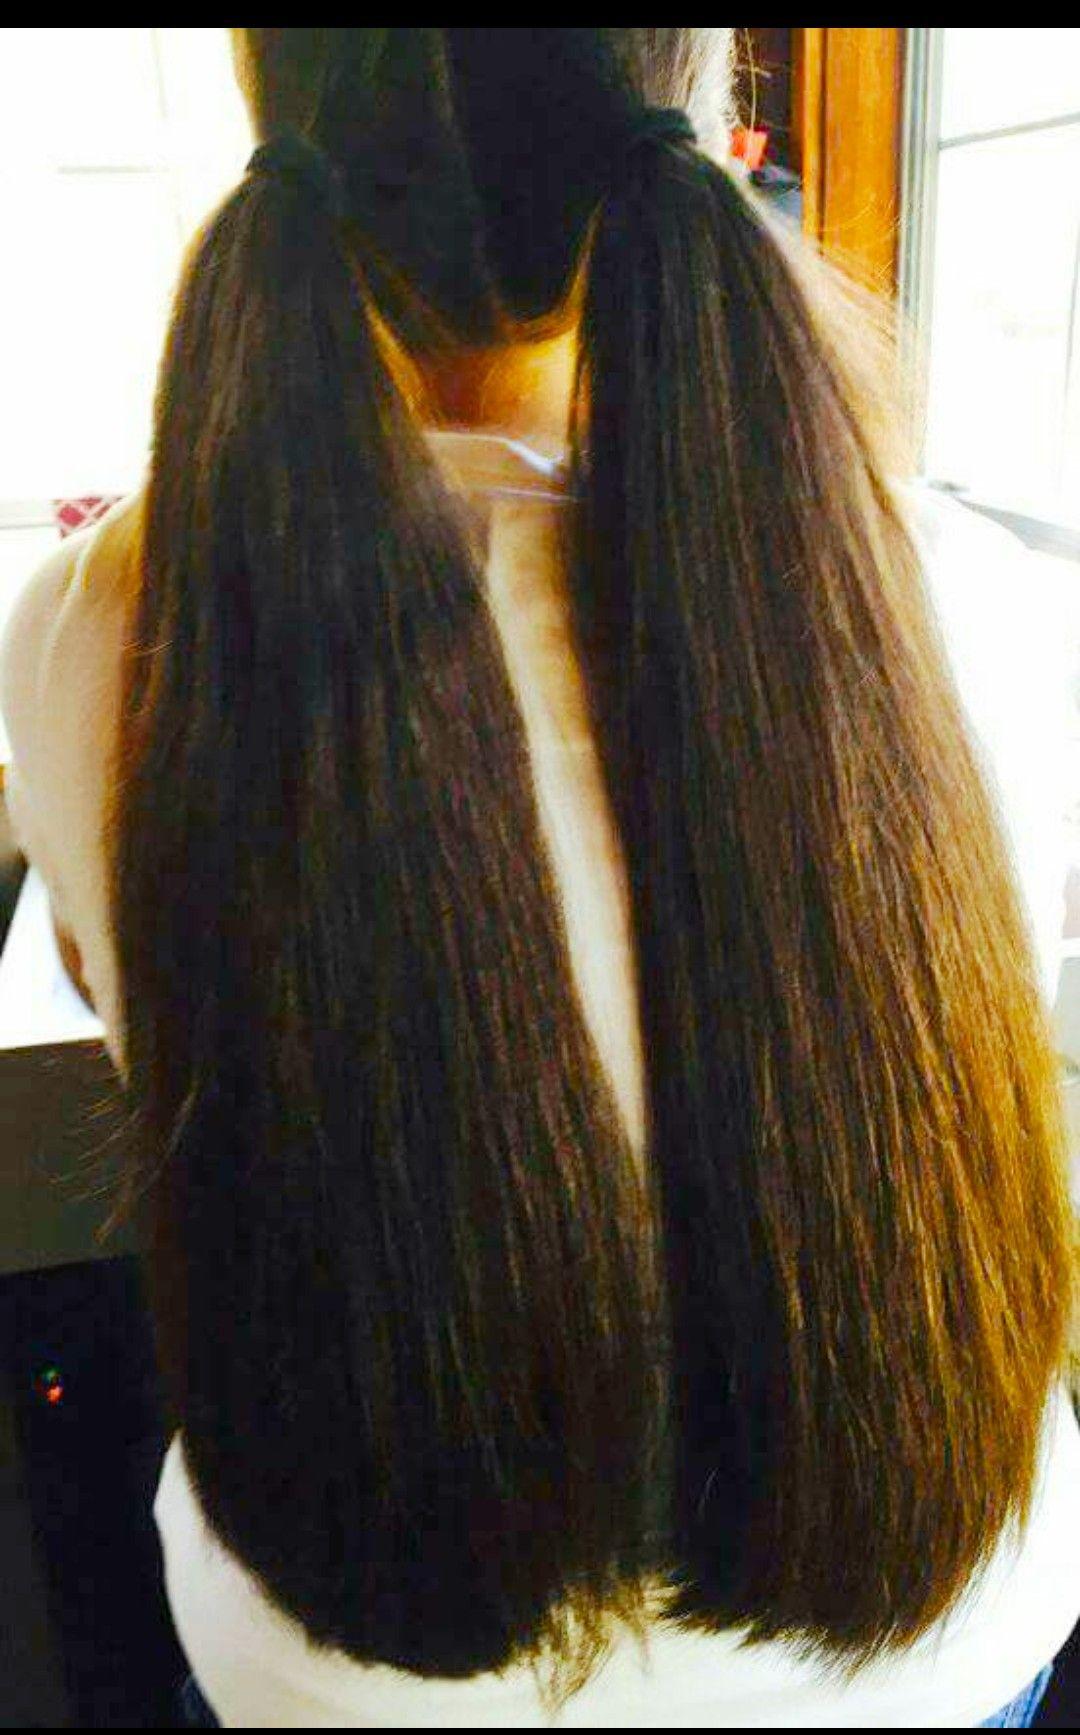 Haircutting #SilkySmoothHair  Long hair styles, Long hair